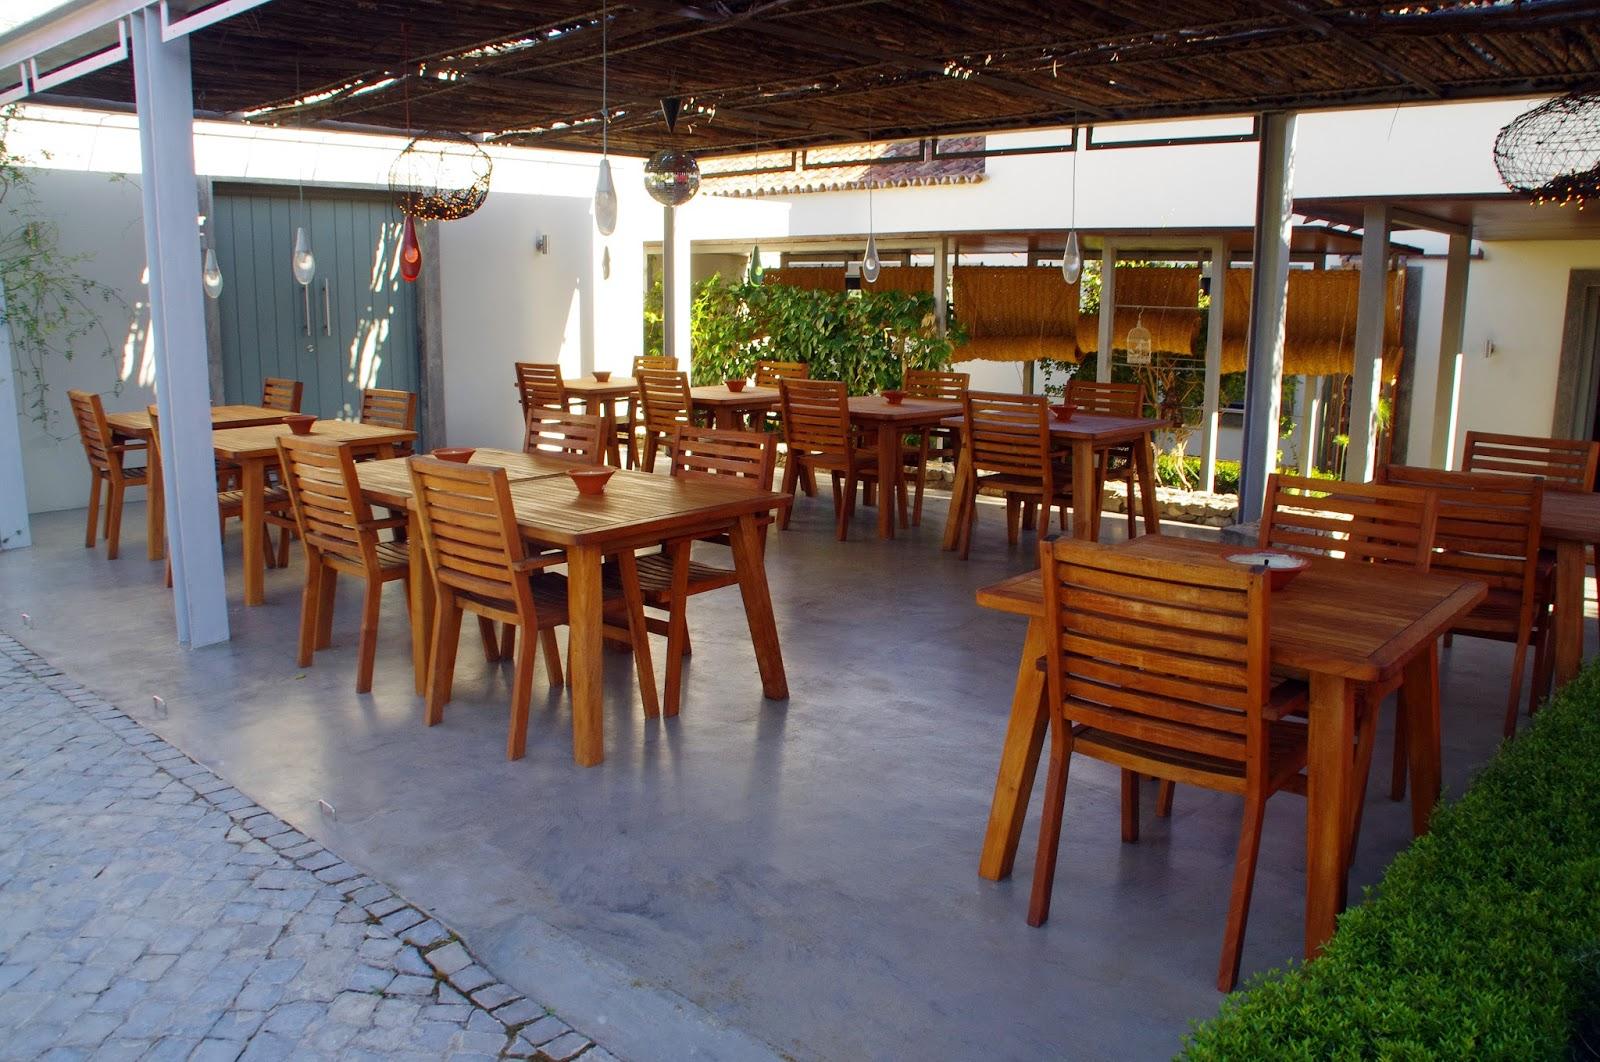 Outdoor seating at Fazenda Nova Country House